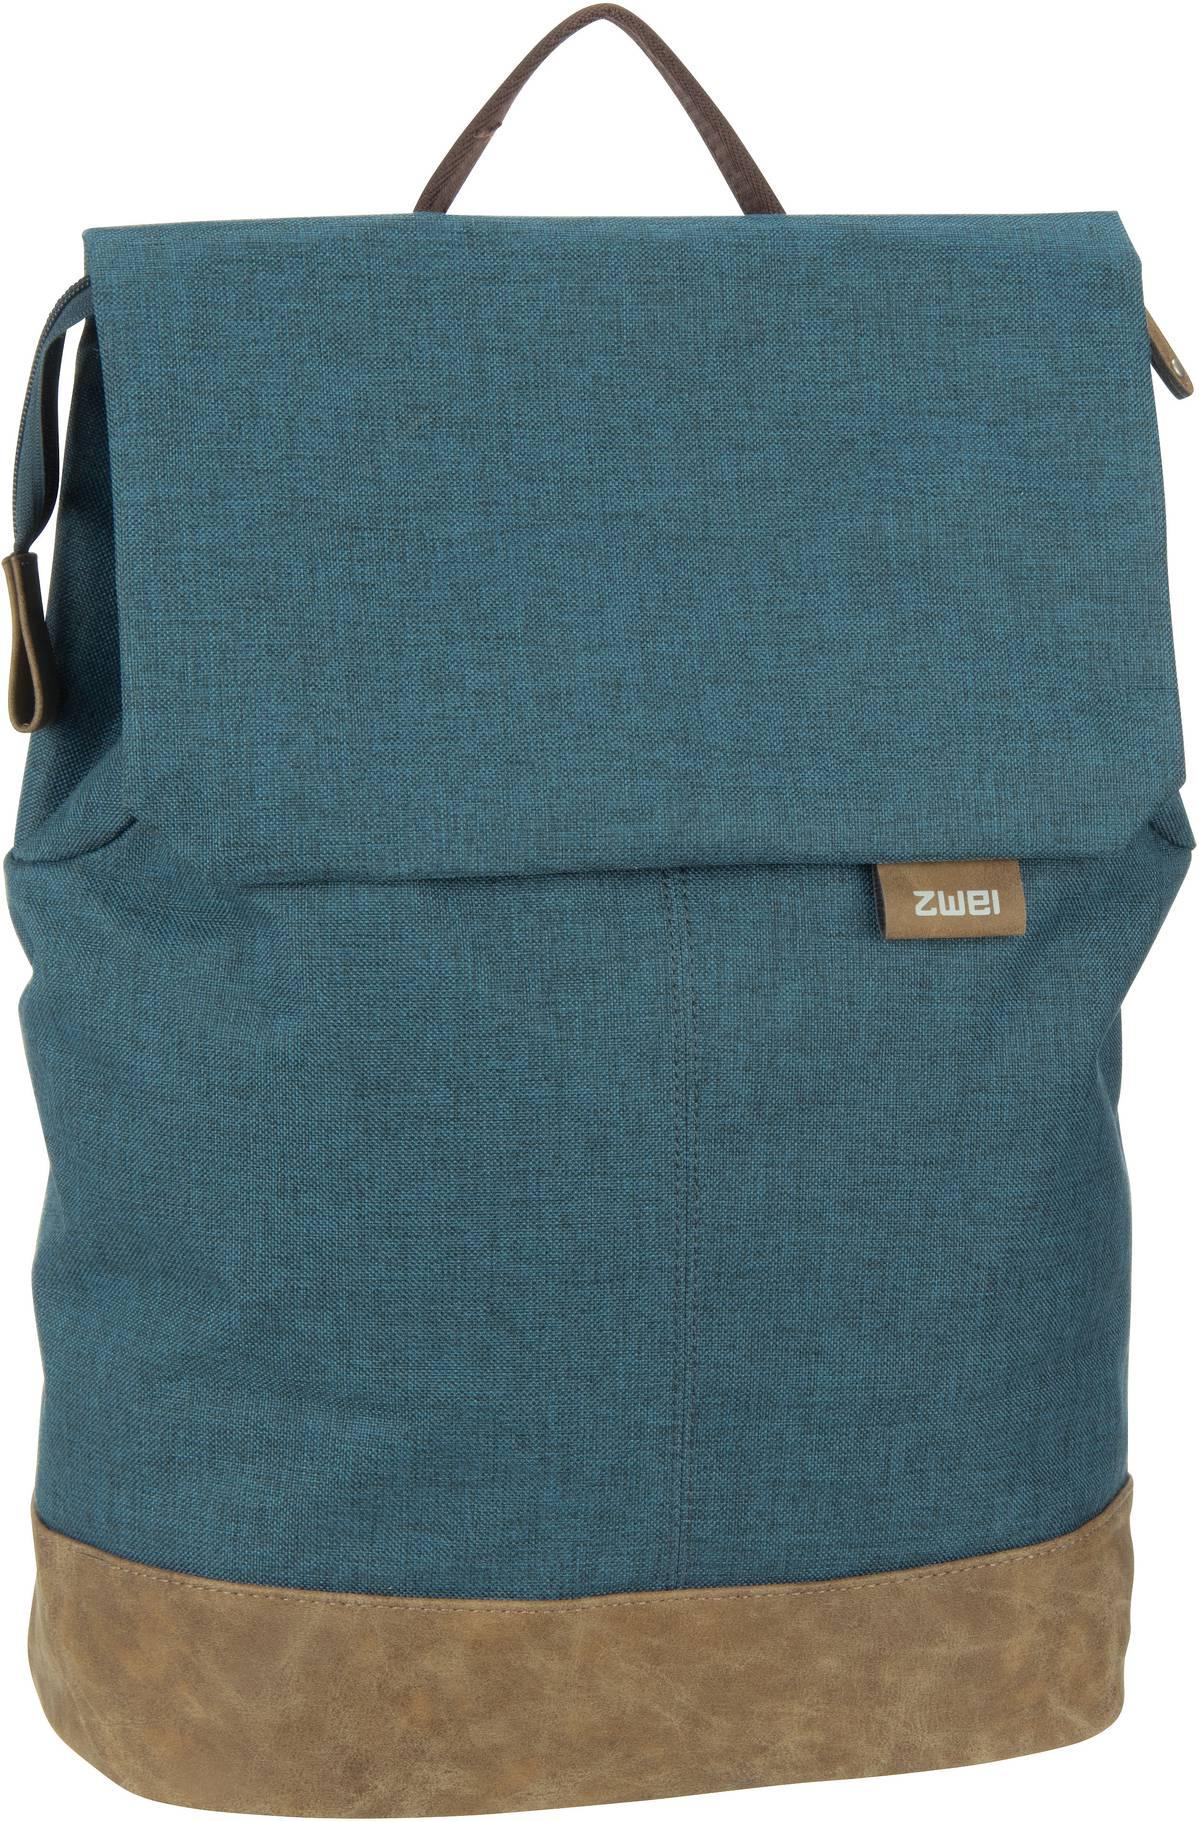 Rucksack / Daypack Olli OR14 Blue (14 Liter)